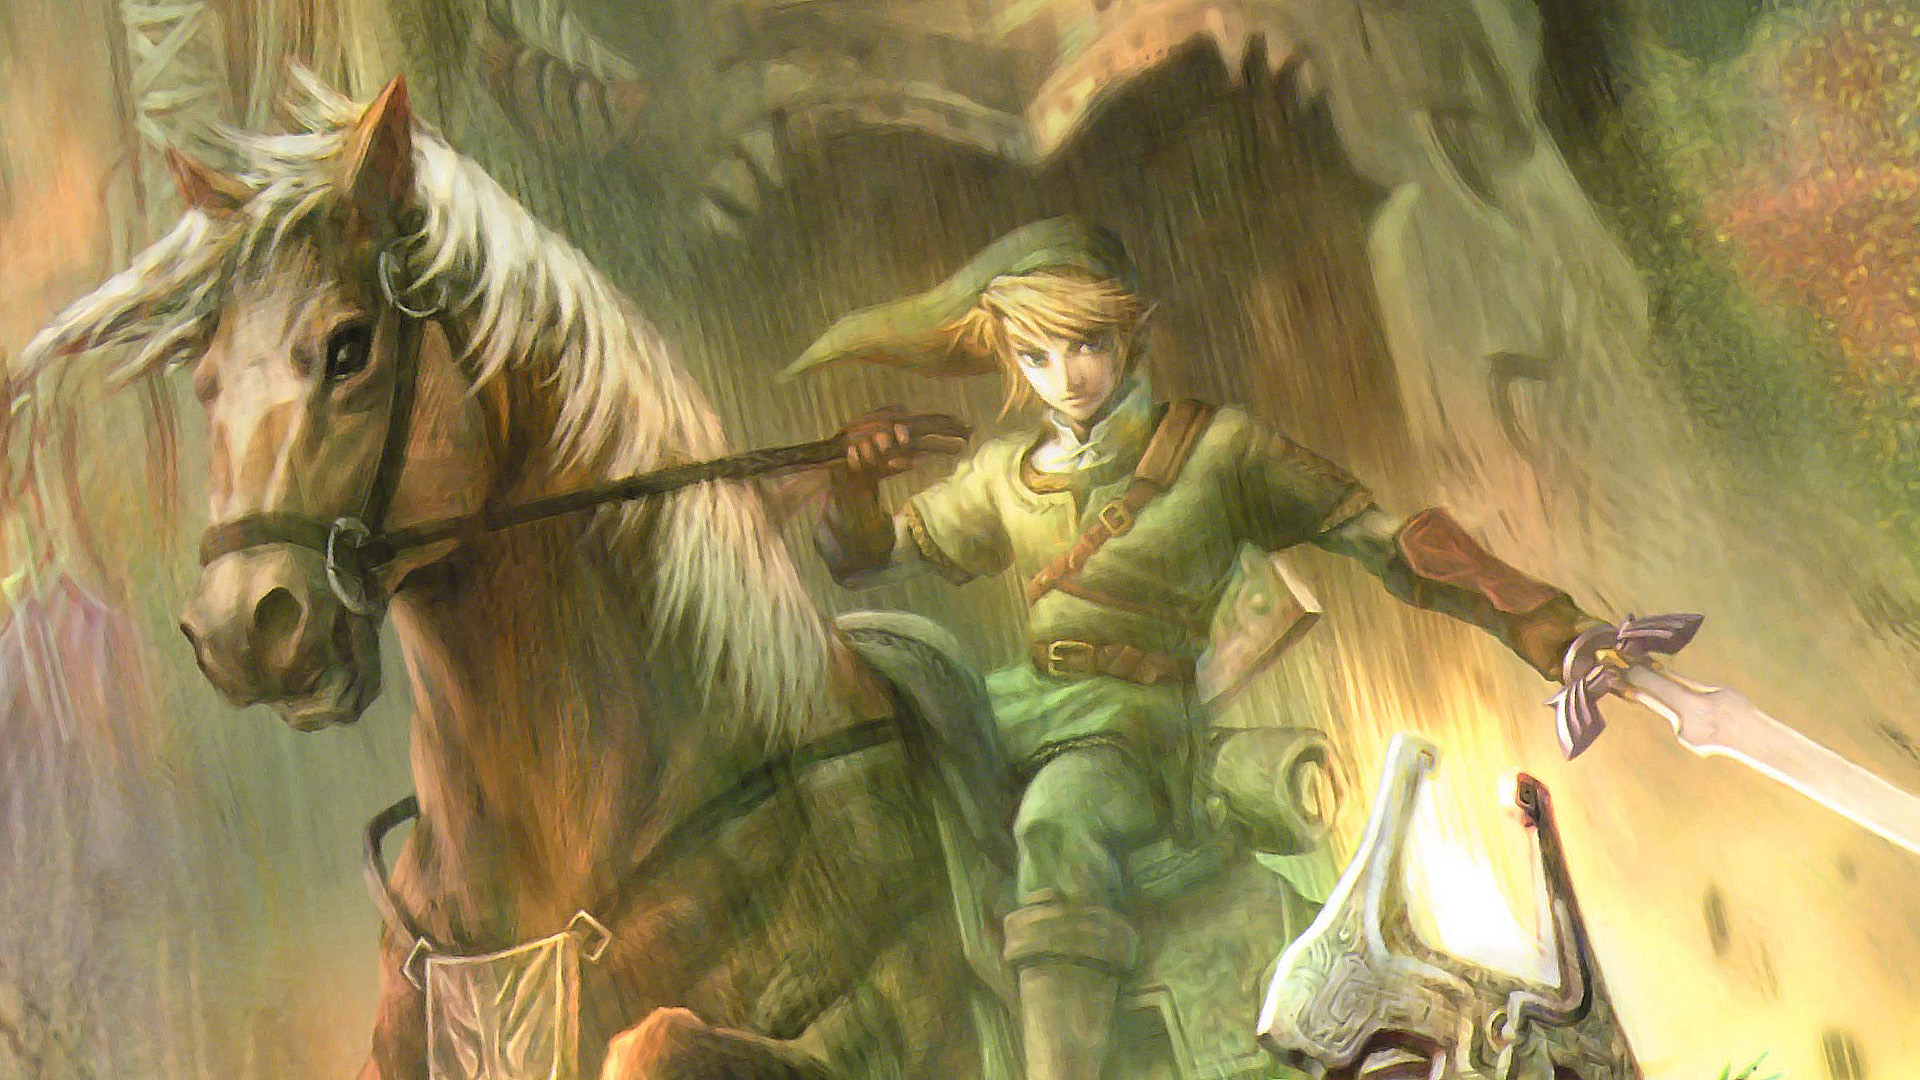 The Legend Of Zelda Twilight Princess Hd Wallpaper Background Image 1920x1080 Id 531812 Wallpaper Abyss